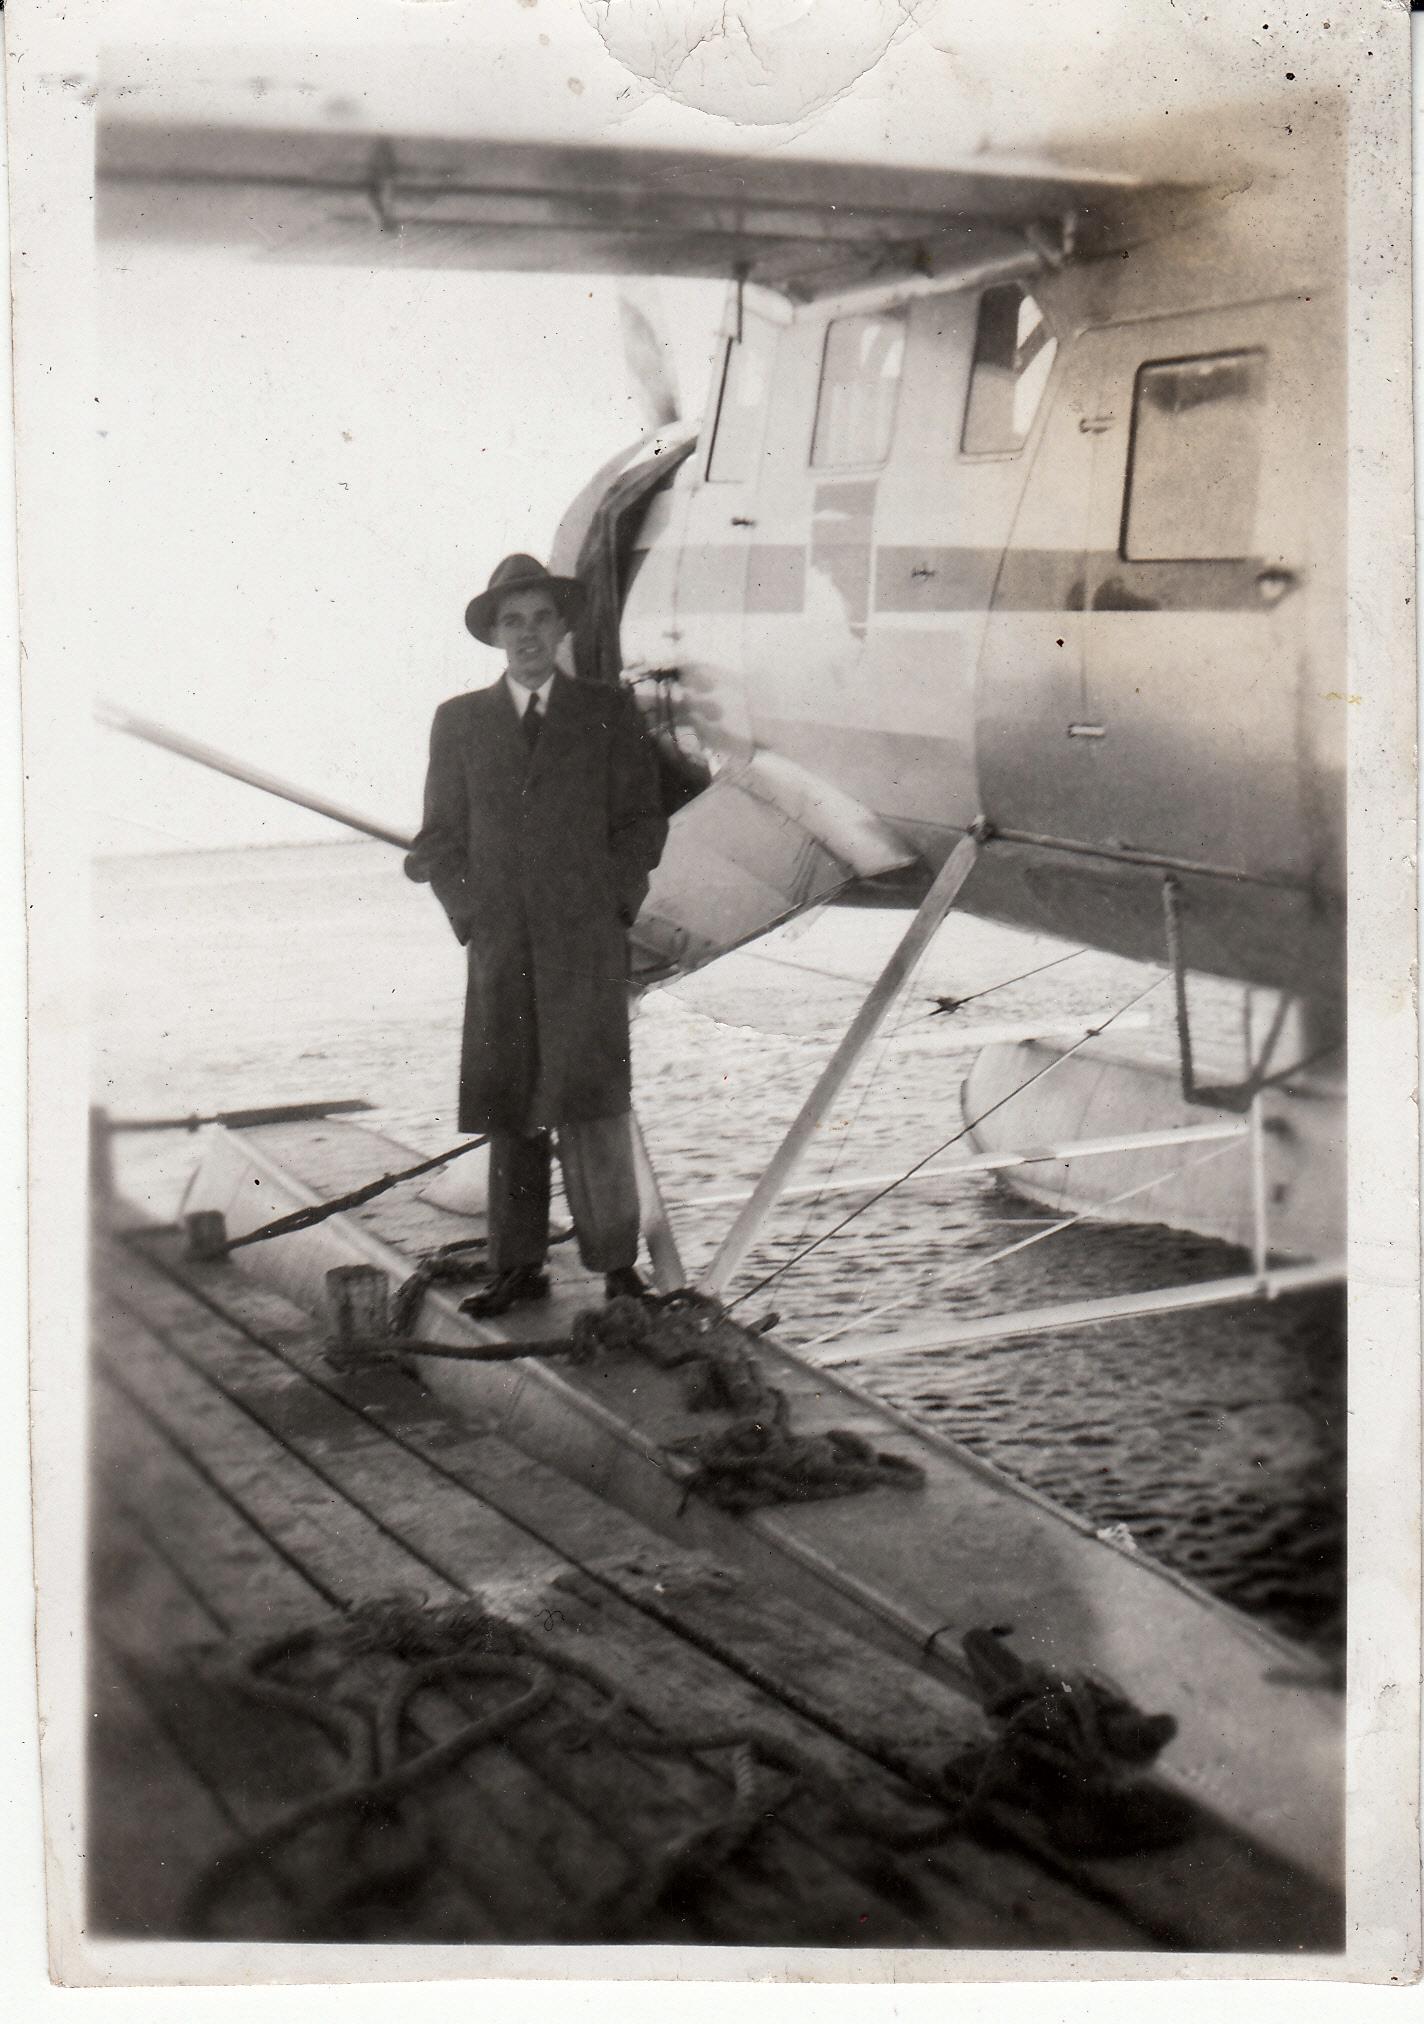 Photo de ALBERT MOISAN – Albert Moisan au côté d'un hydravion.